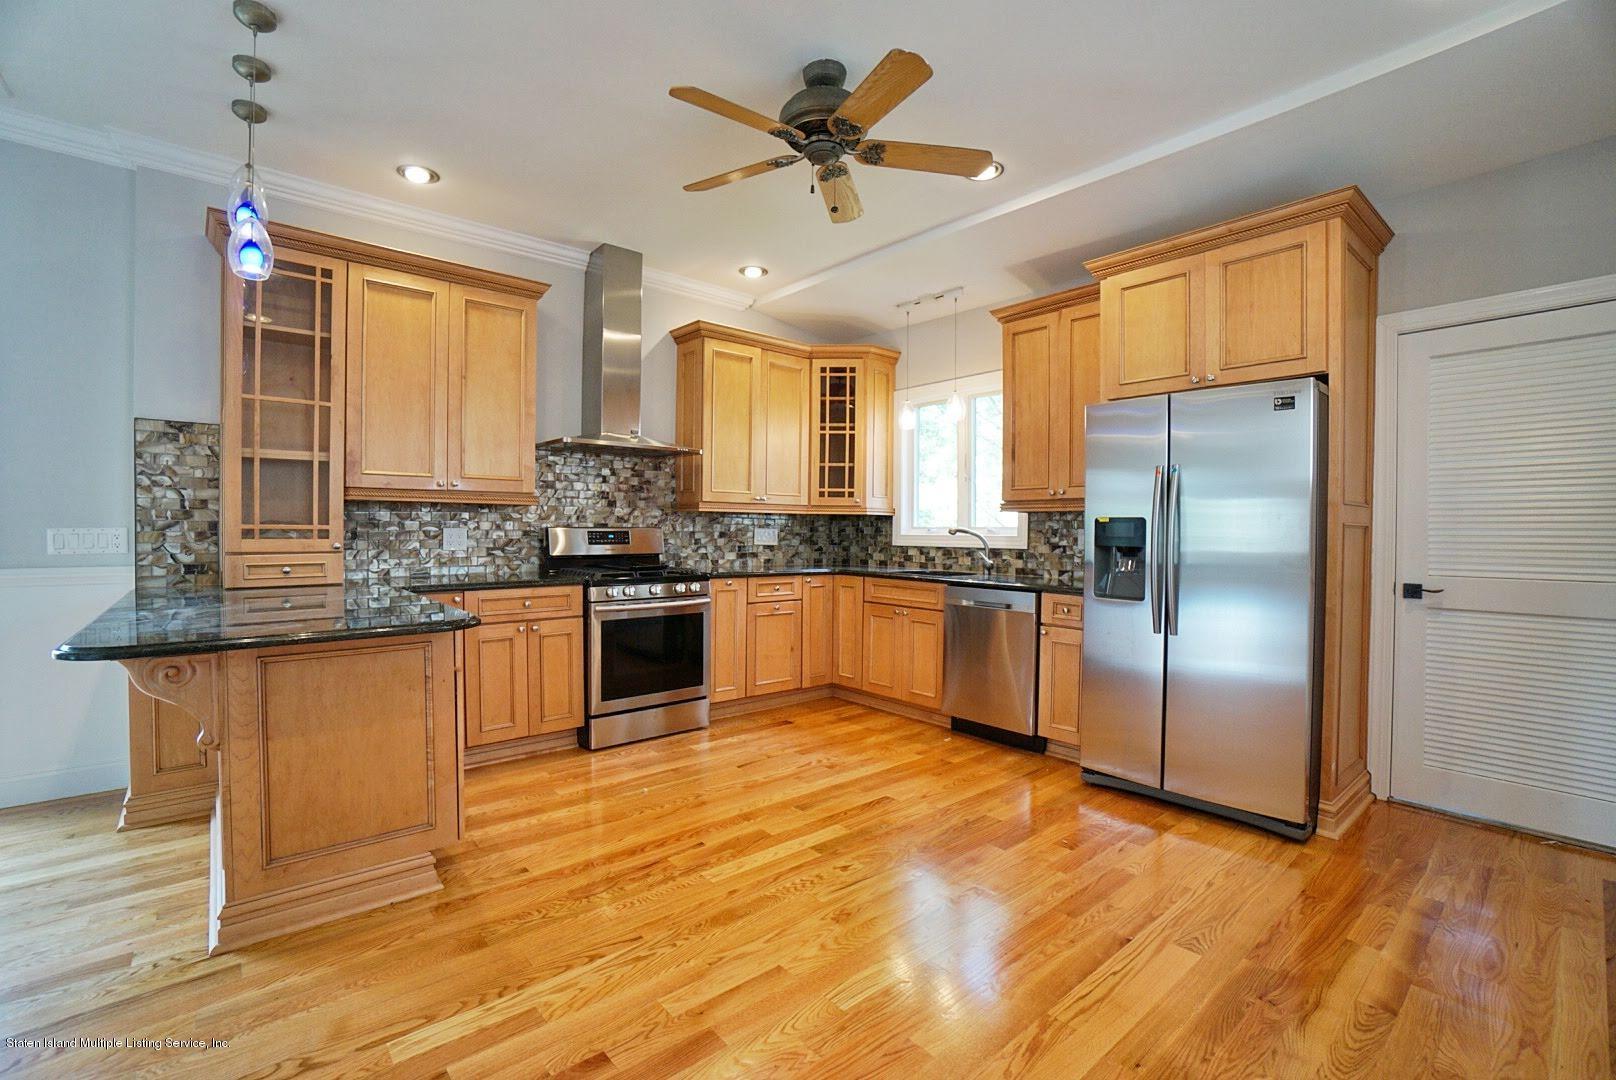 Single Family - Detached 445 Manhattan Street  Staten Island, NY 10307, MLS-1130505-10